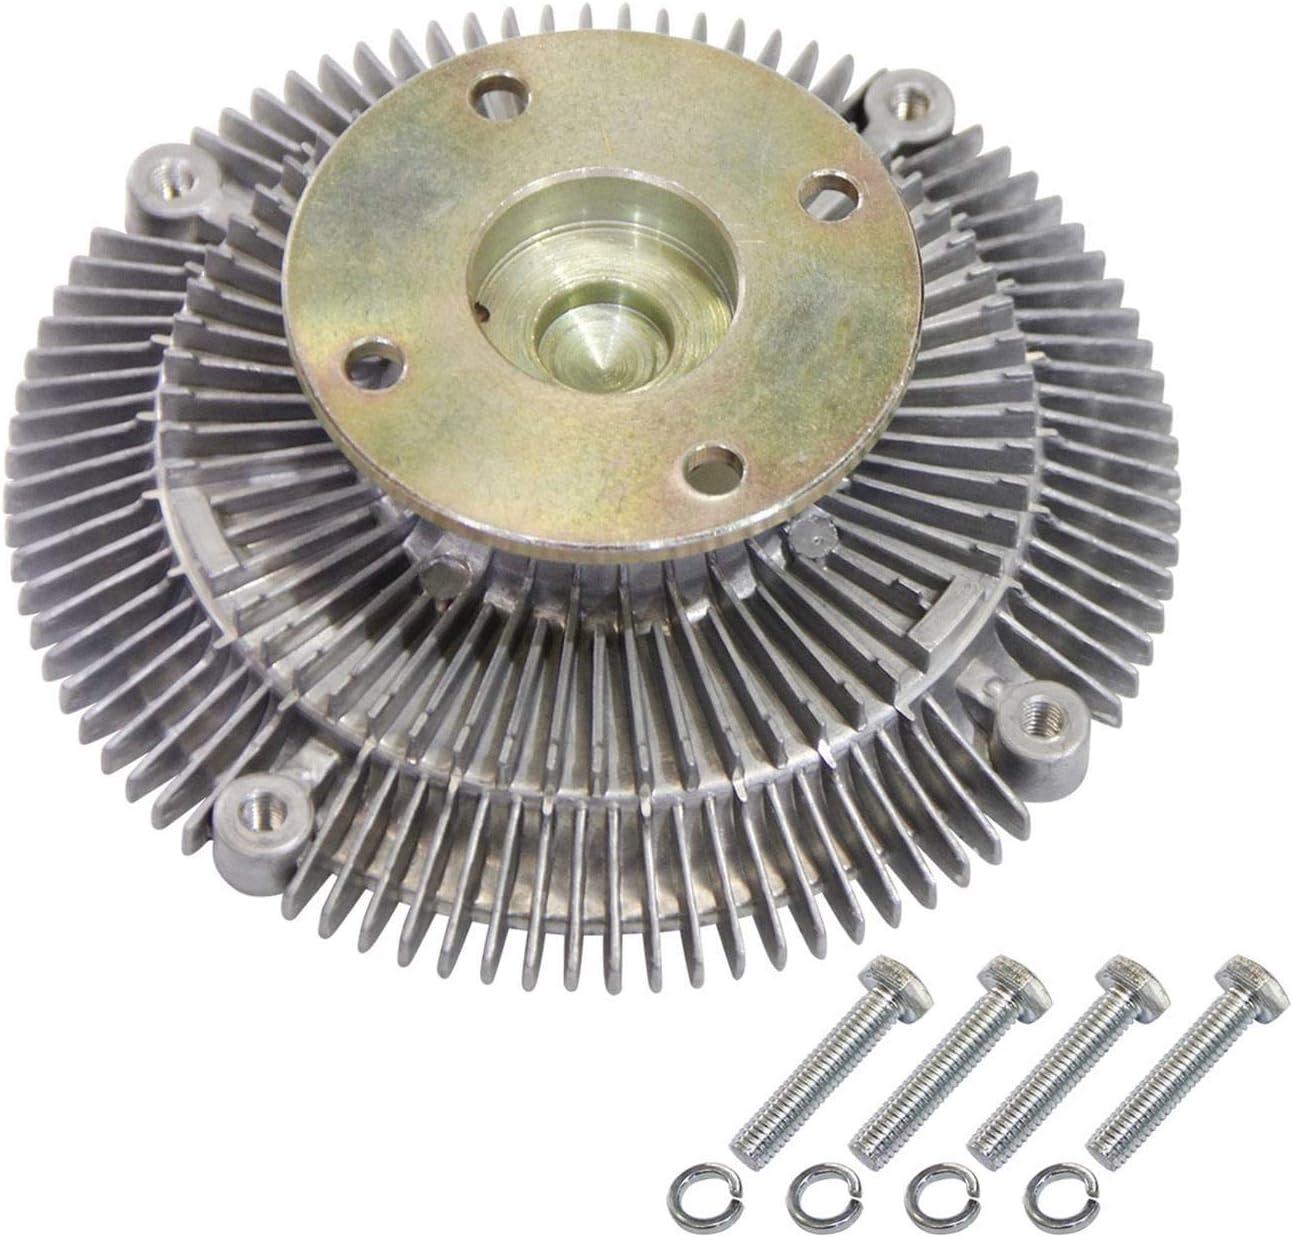 GATES Engine Water Pump for Nissan D21 L4; 2.4L 1990-1994